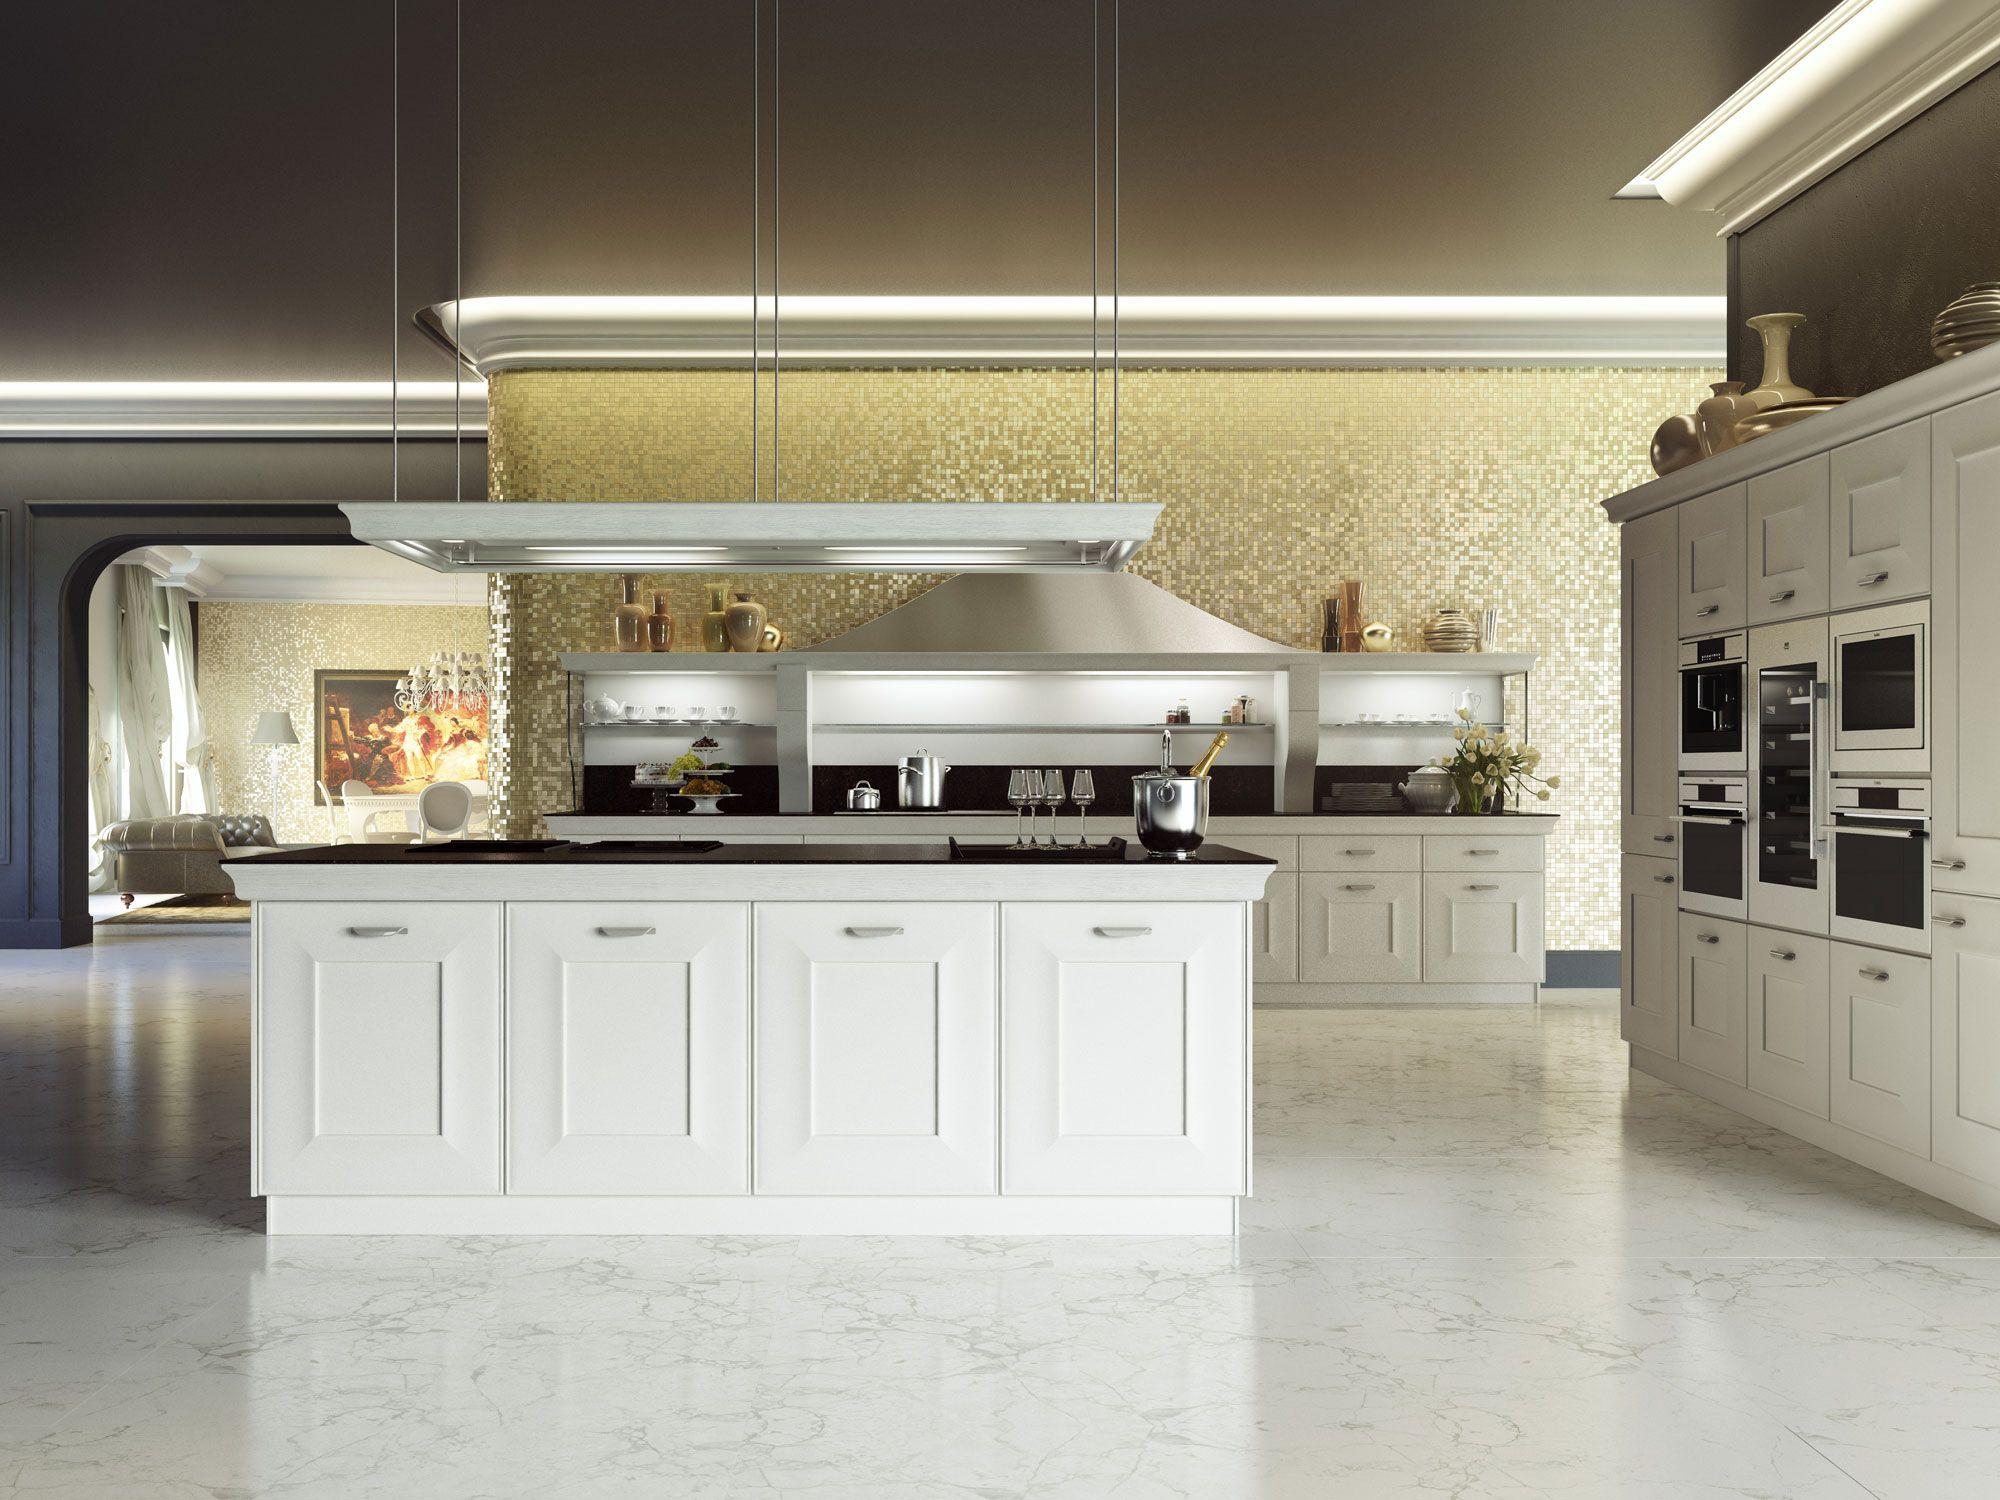 KitchenSnaidero Italian Kitchens With Pizzazz Homecentrl White Ultra Modern Design Collection From Snaide